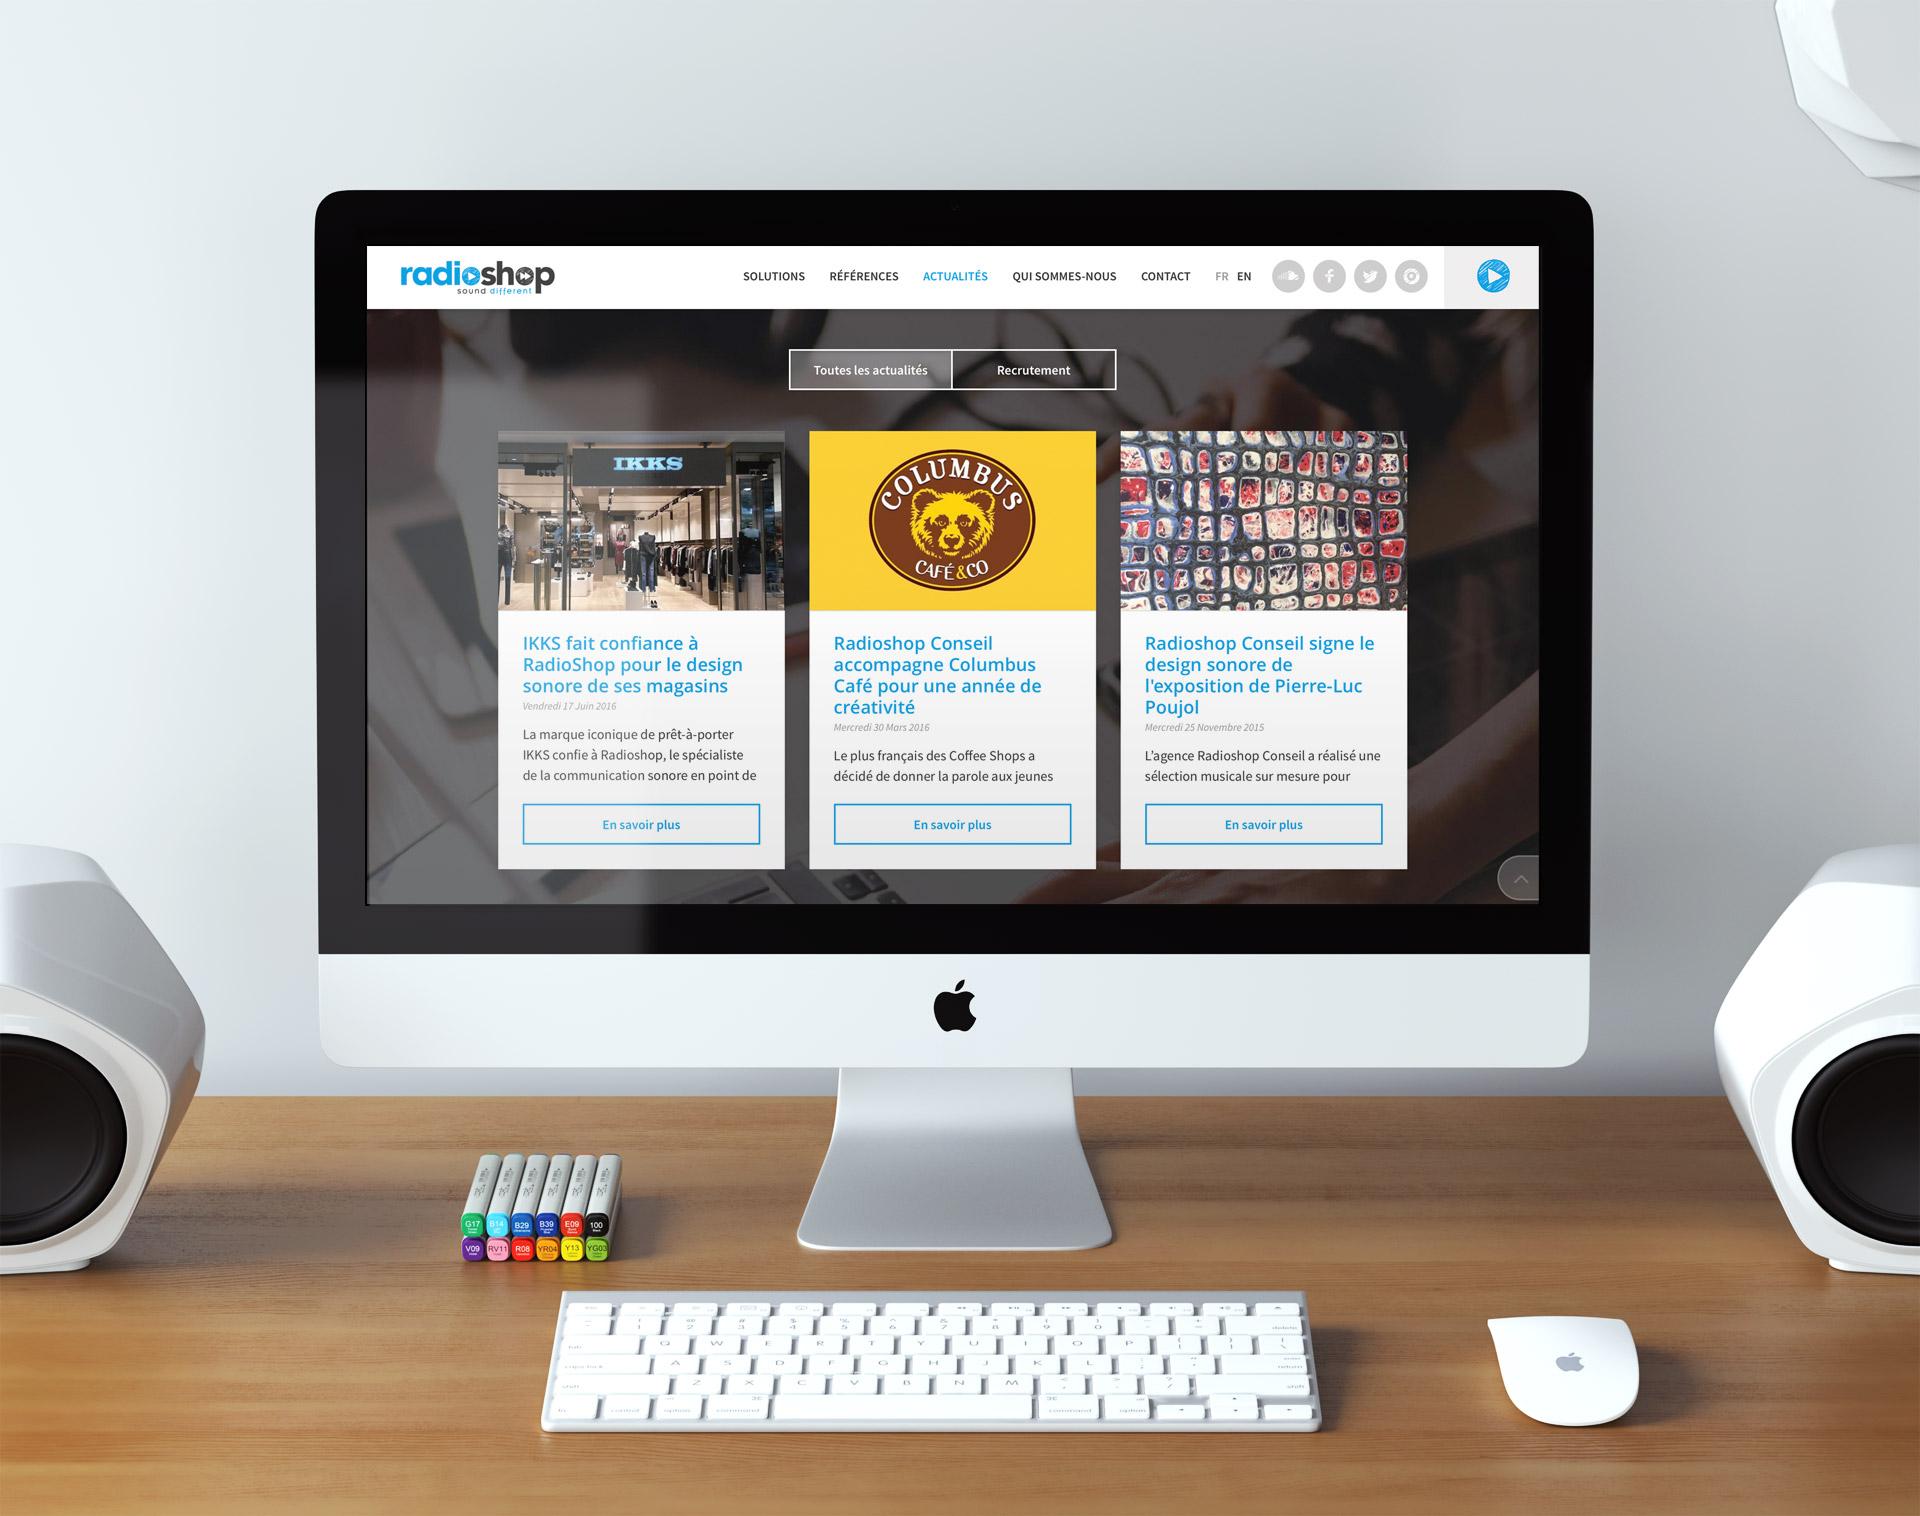 radioshop-creation-site-web-responsive-design-graphiste-montpellier-alexis-cretin-3